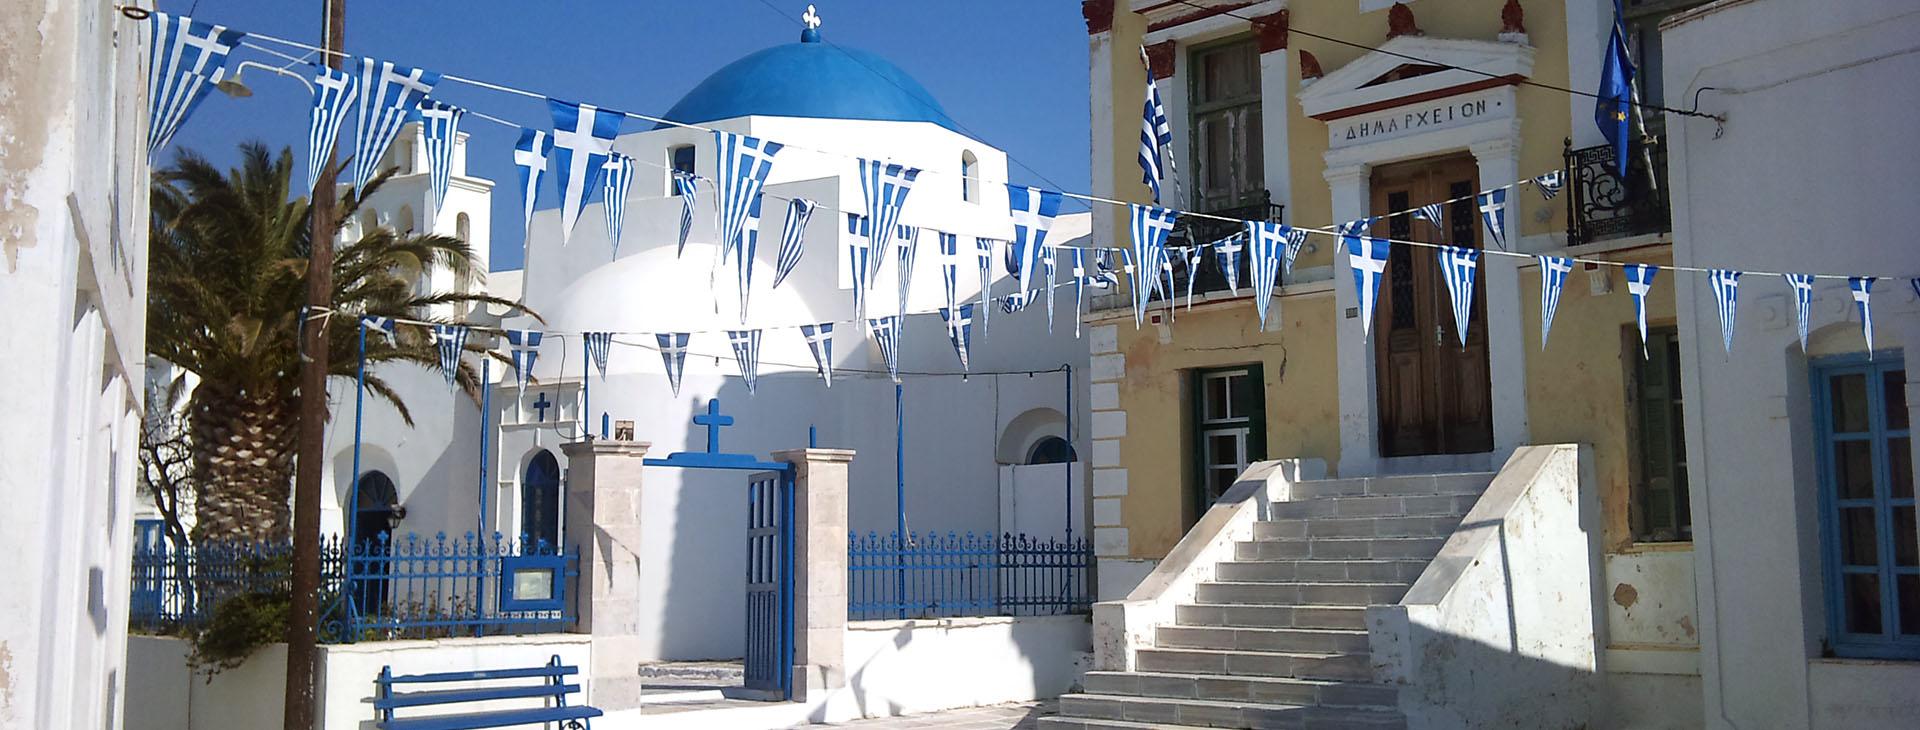 Town Hall, Serifos island